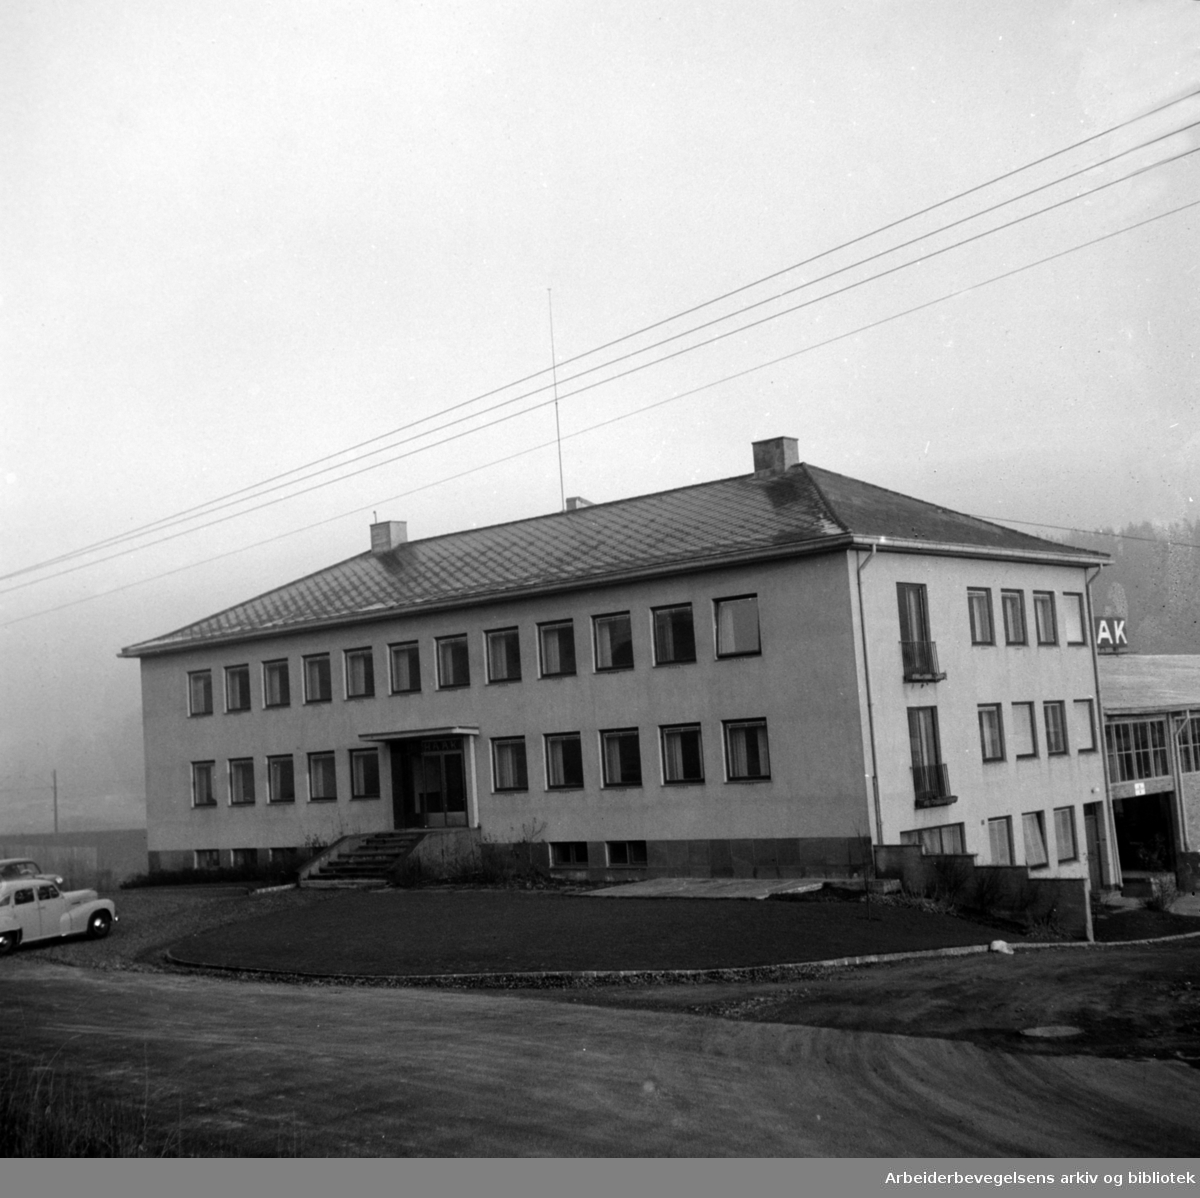 Teisen. Haak & Co. November 1955